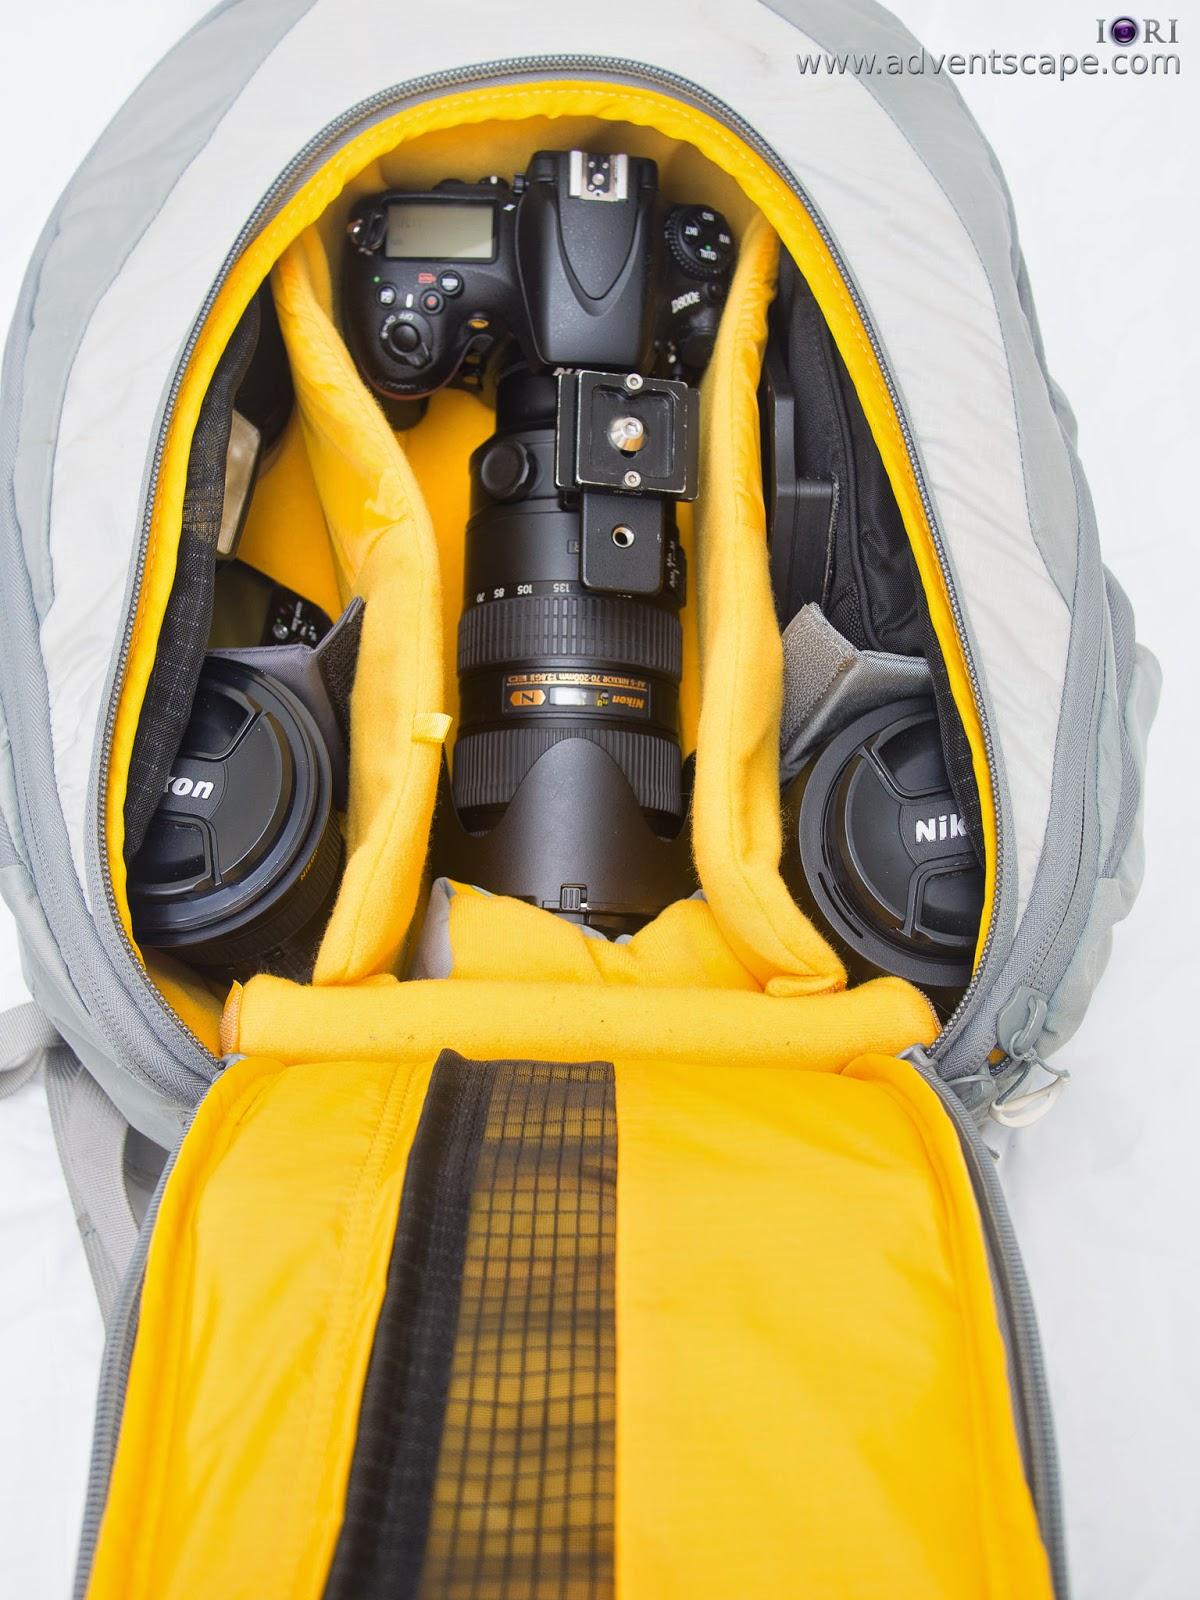 205, adventscape, Australian Landscape Photographer, bag, Bug, Kata, Manfrotto, Philip Avellana, review